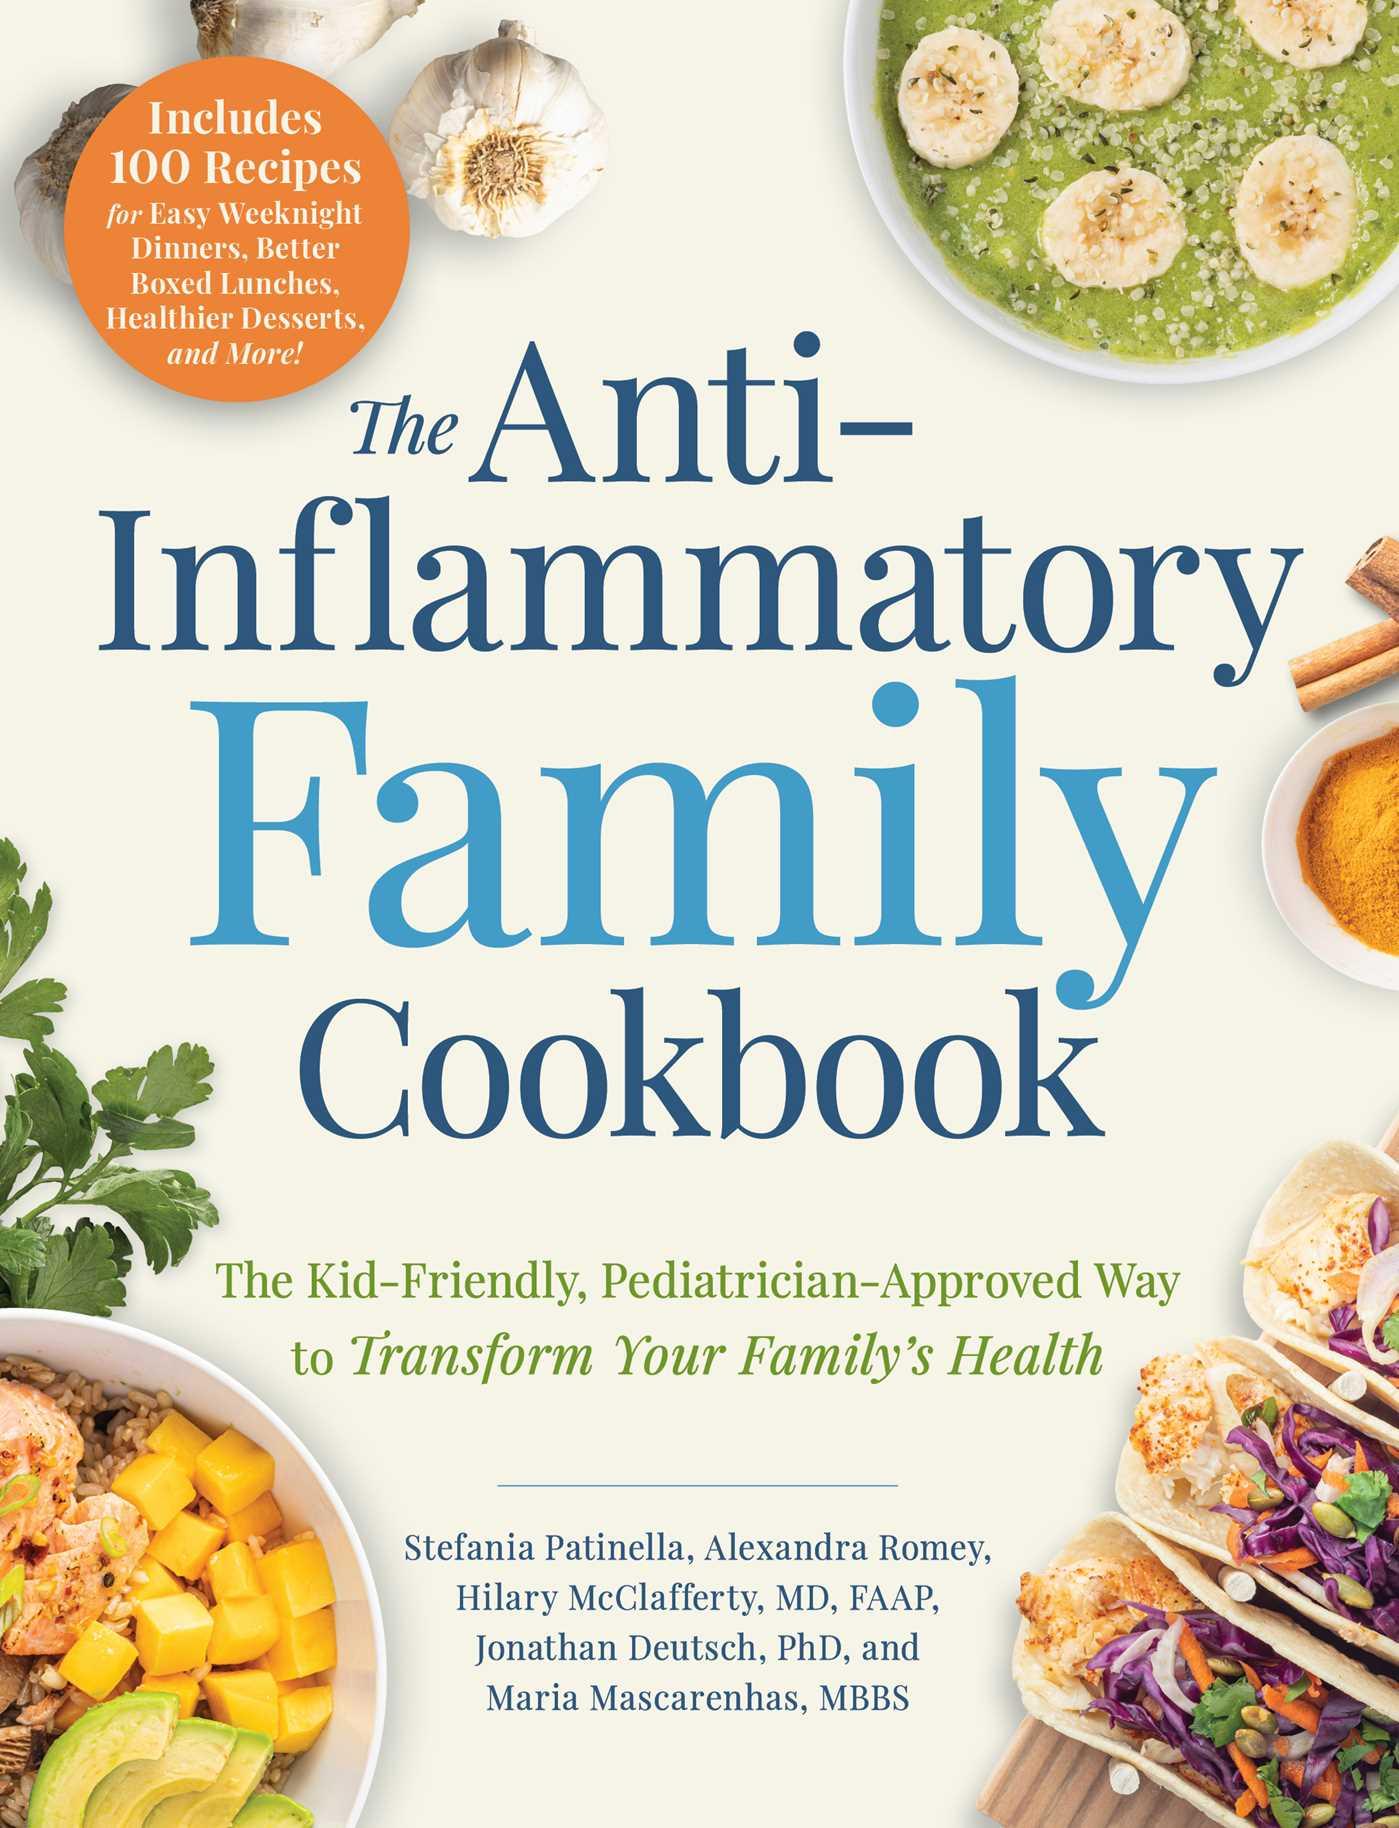 [PDF] [EPUB] The Anti-Inflammatory Family Cookbook: 100 Anti-Inflammatory Recipes the Whole Family Will Love! Download by Stefania Patinella